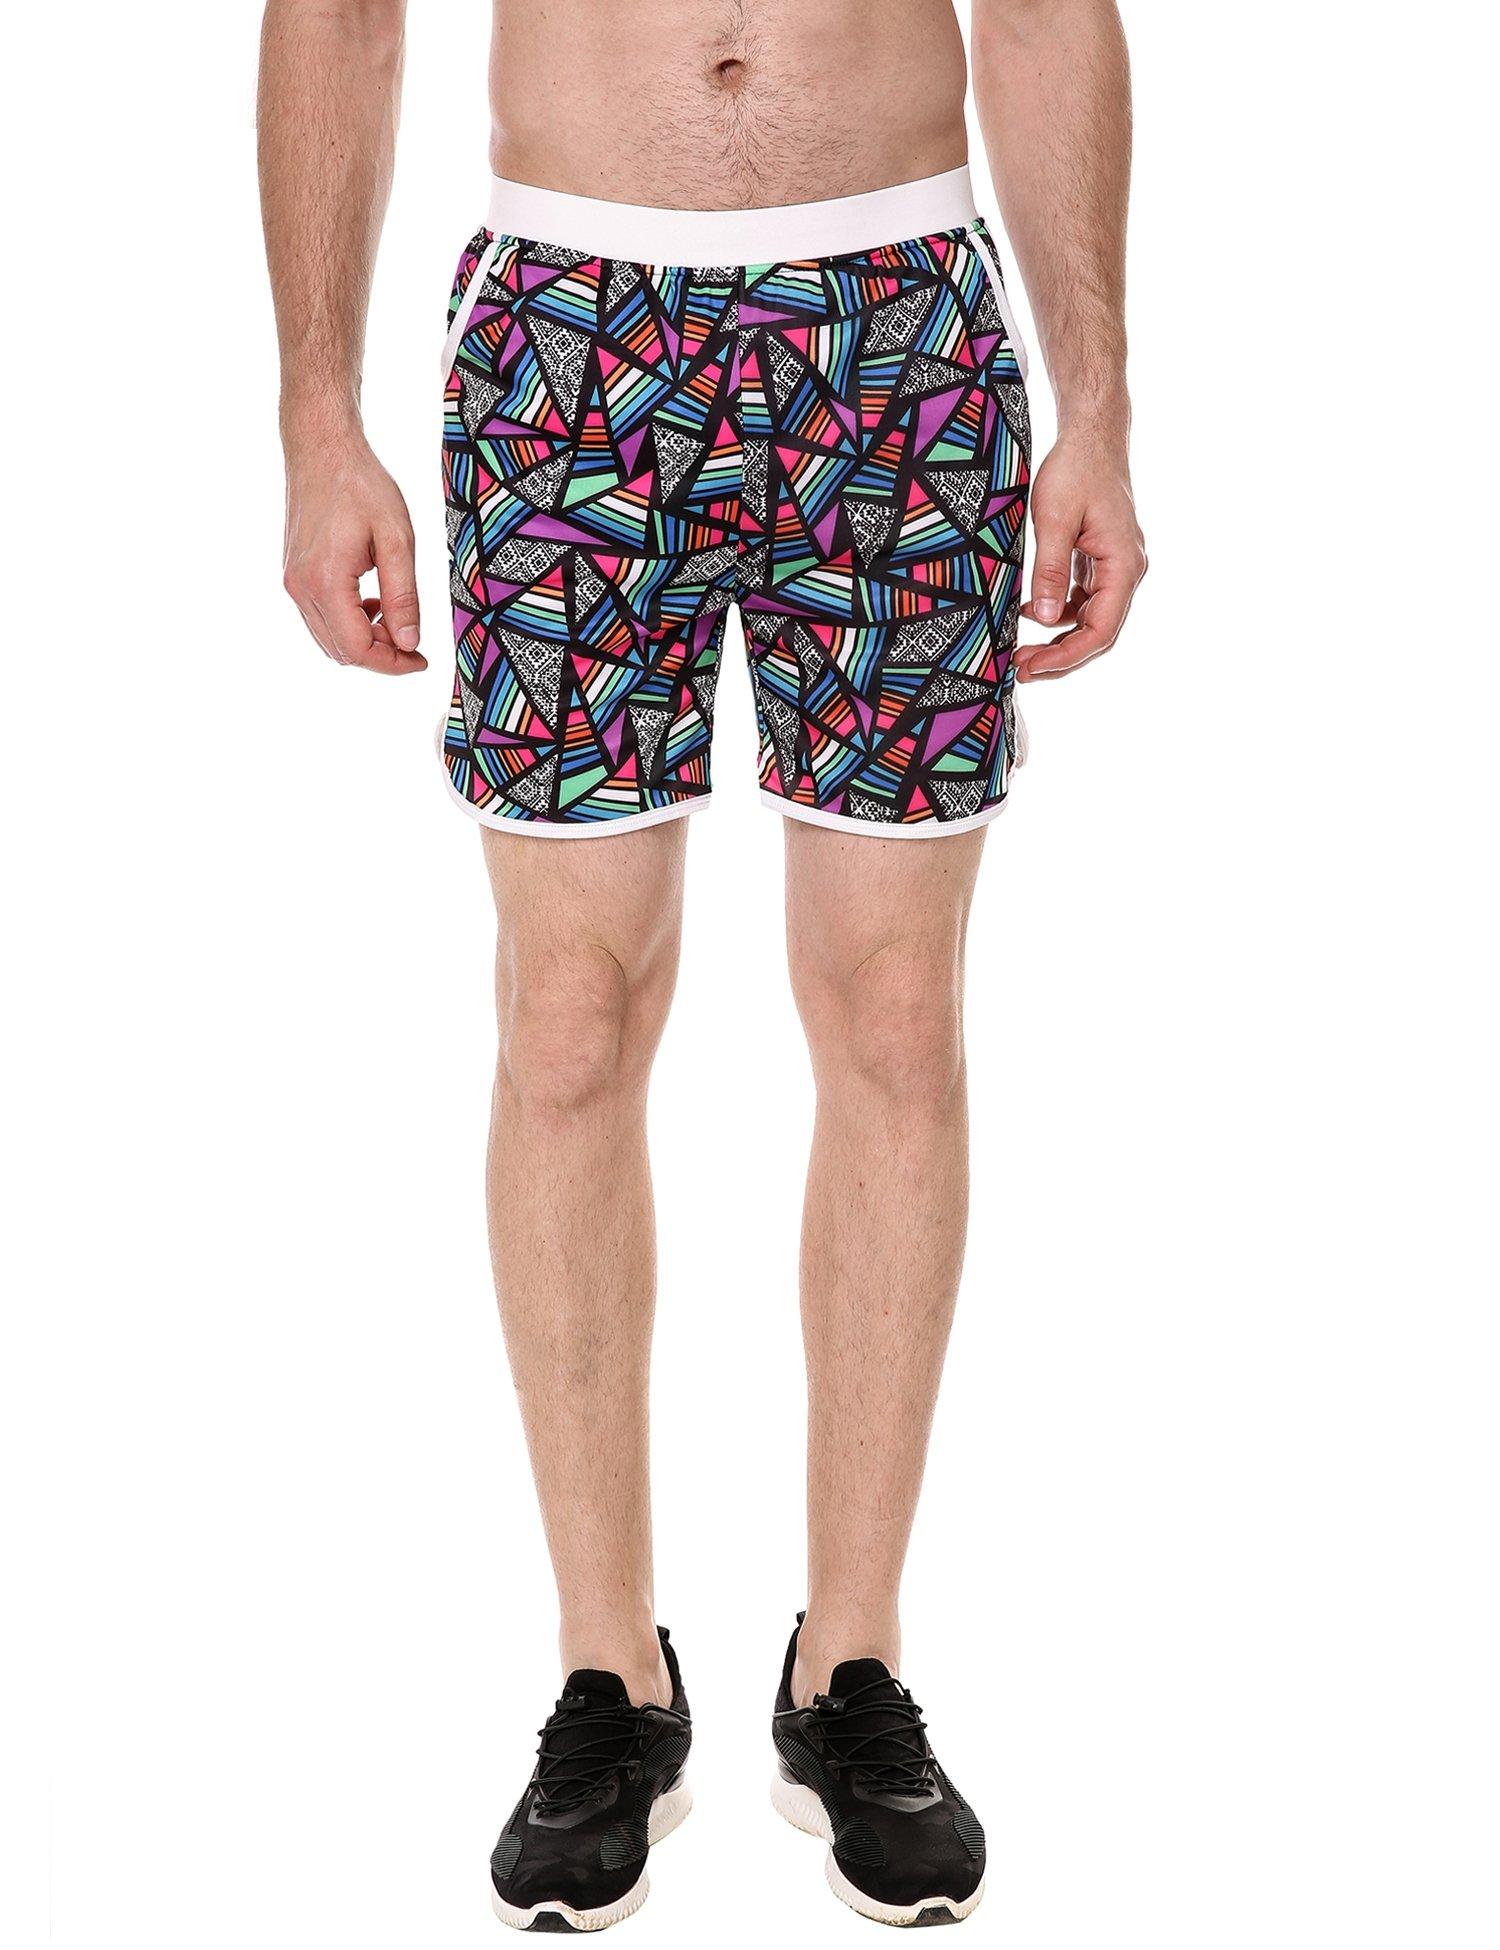 COOFANDY Men's Quick Dry Mid-Waisted Coconut Print Hawaiian Style Beach Shorts Swim Trunks (XXL, Print)